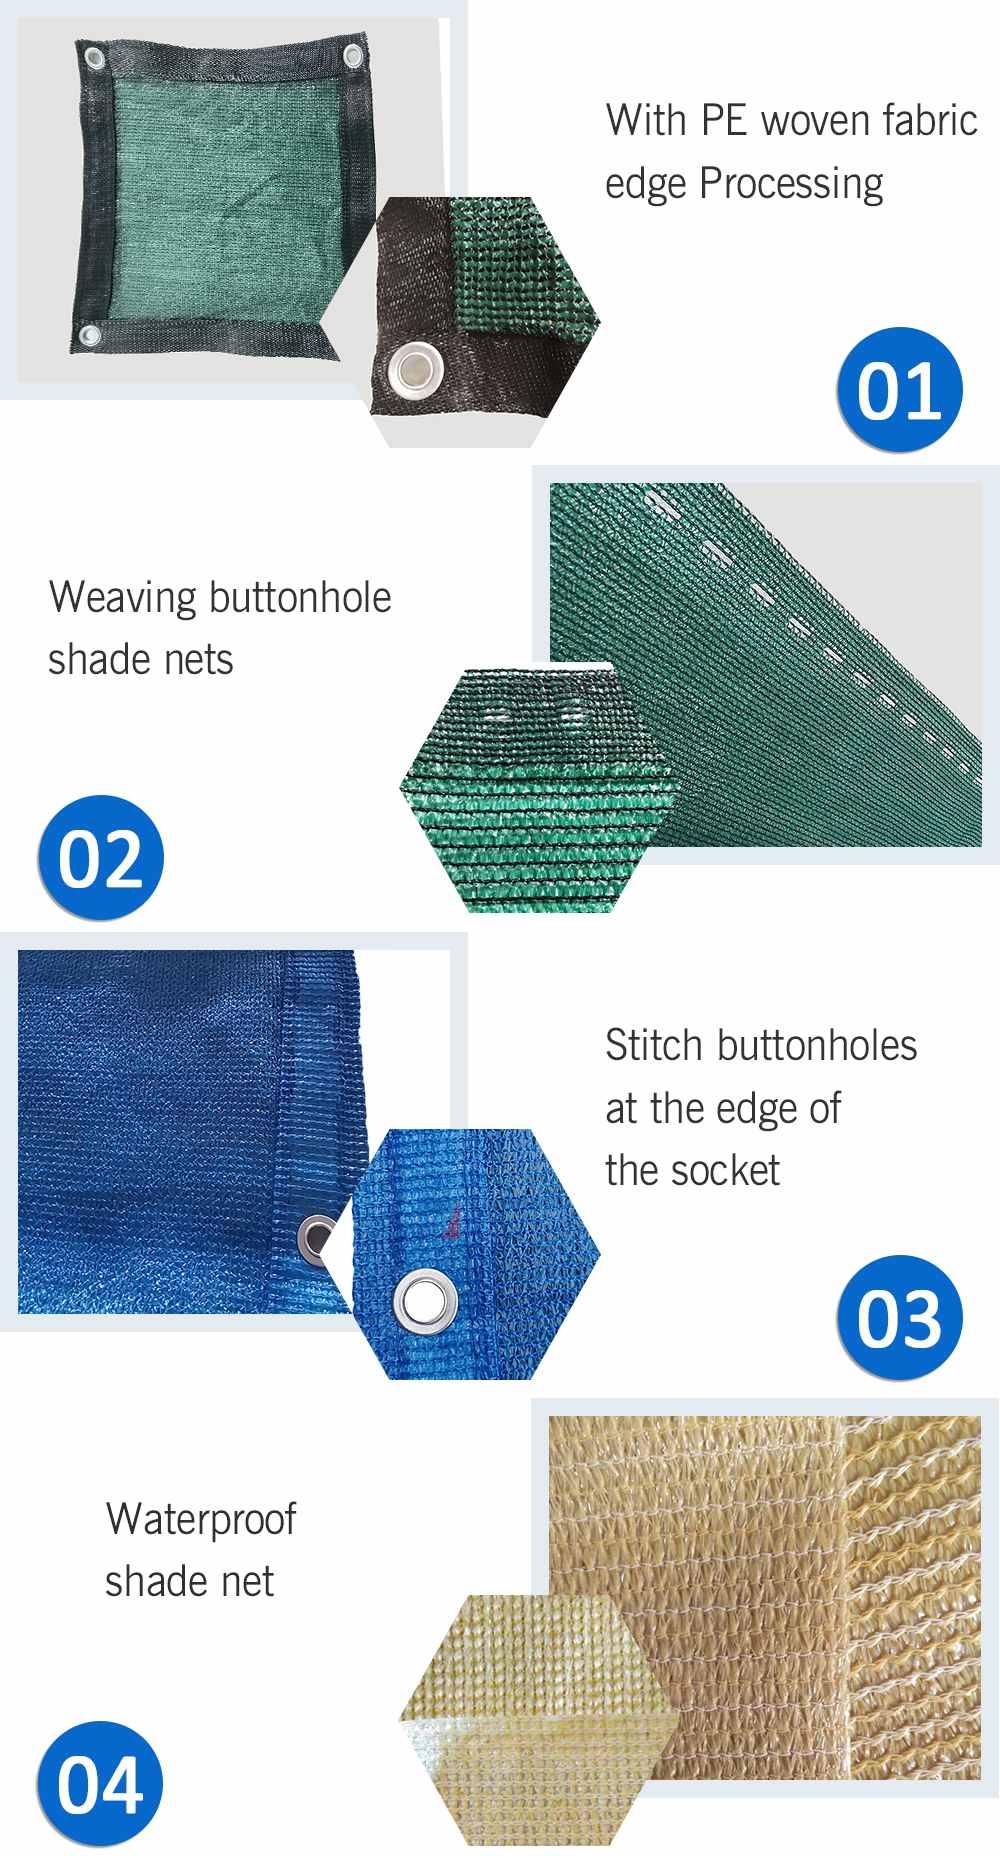 Moisturizing principle of shade net